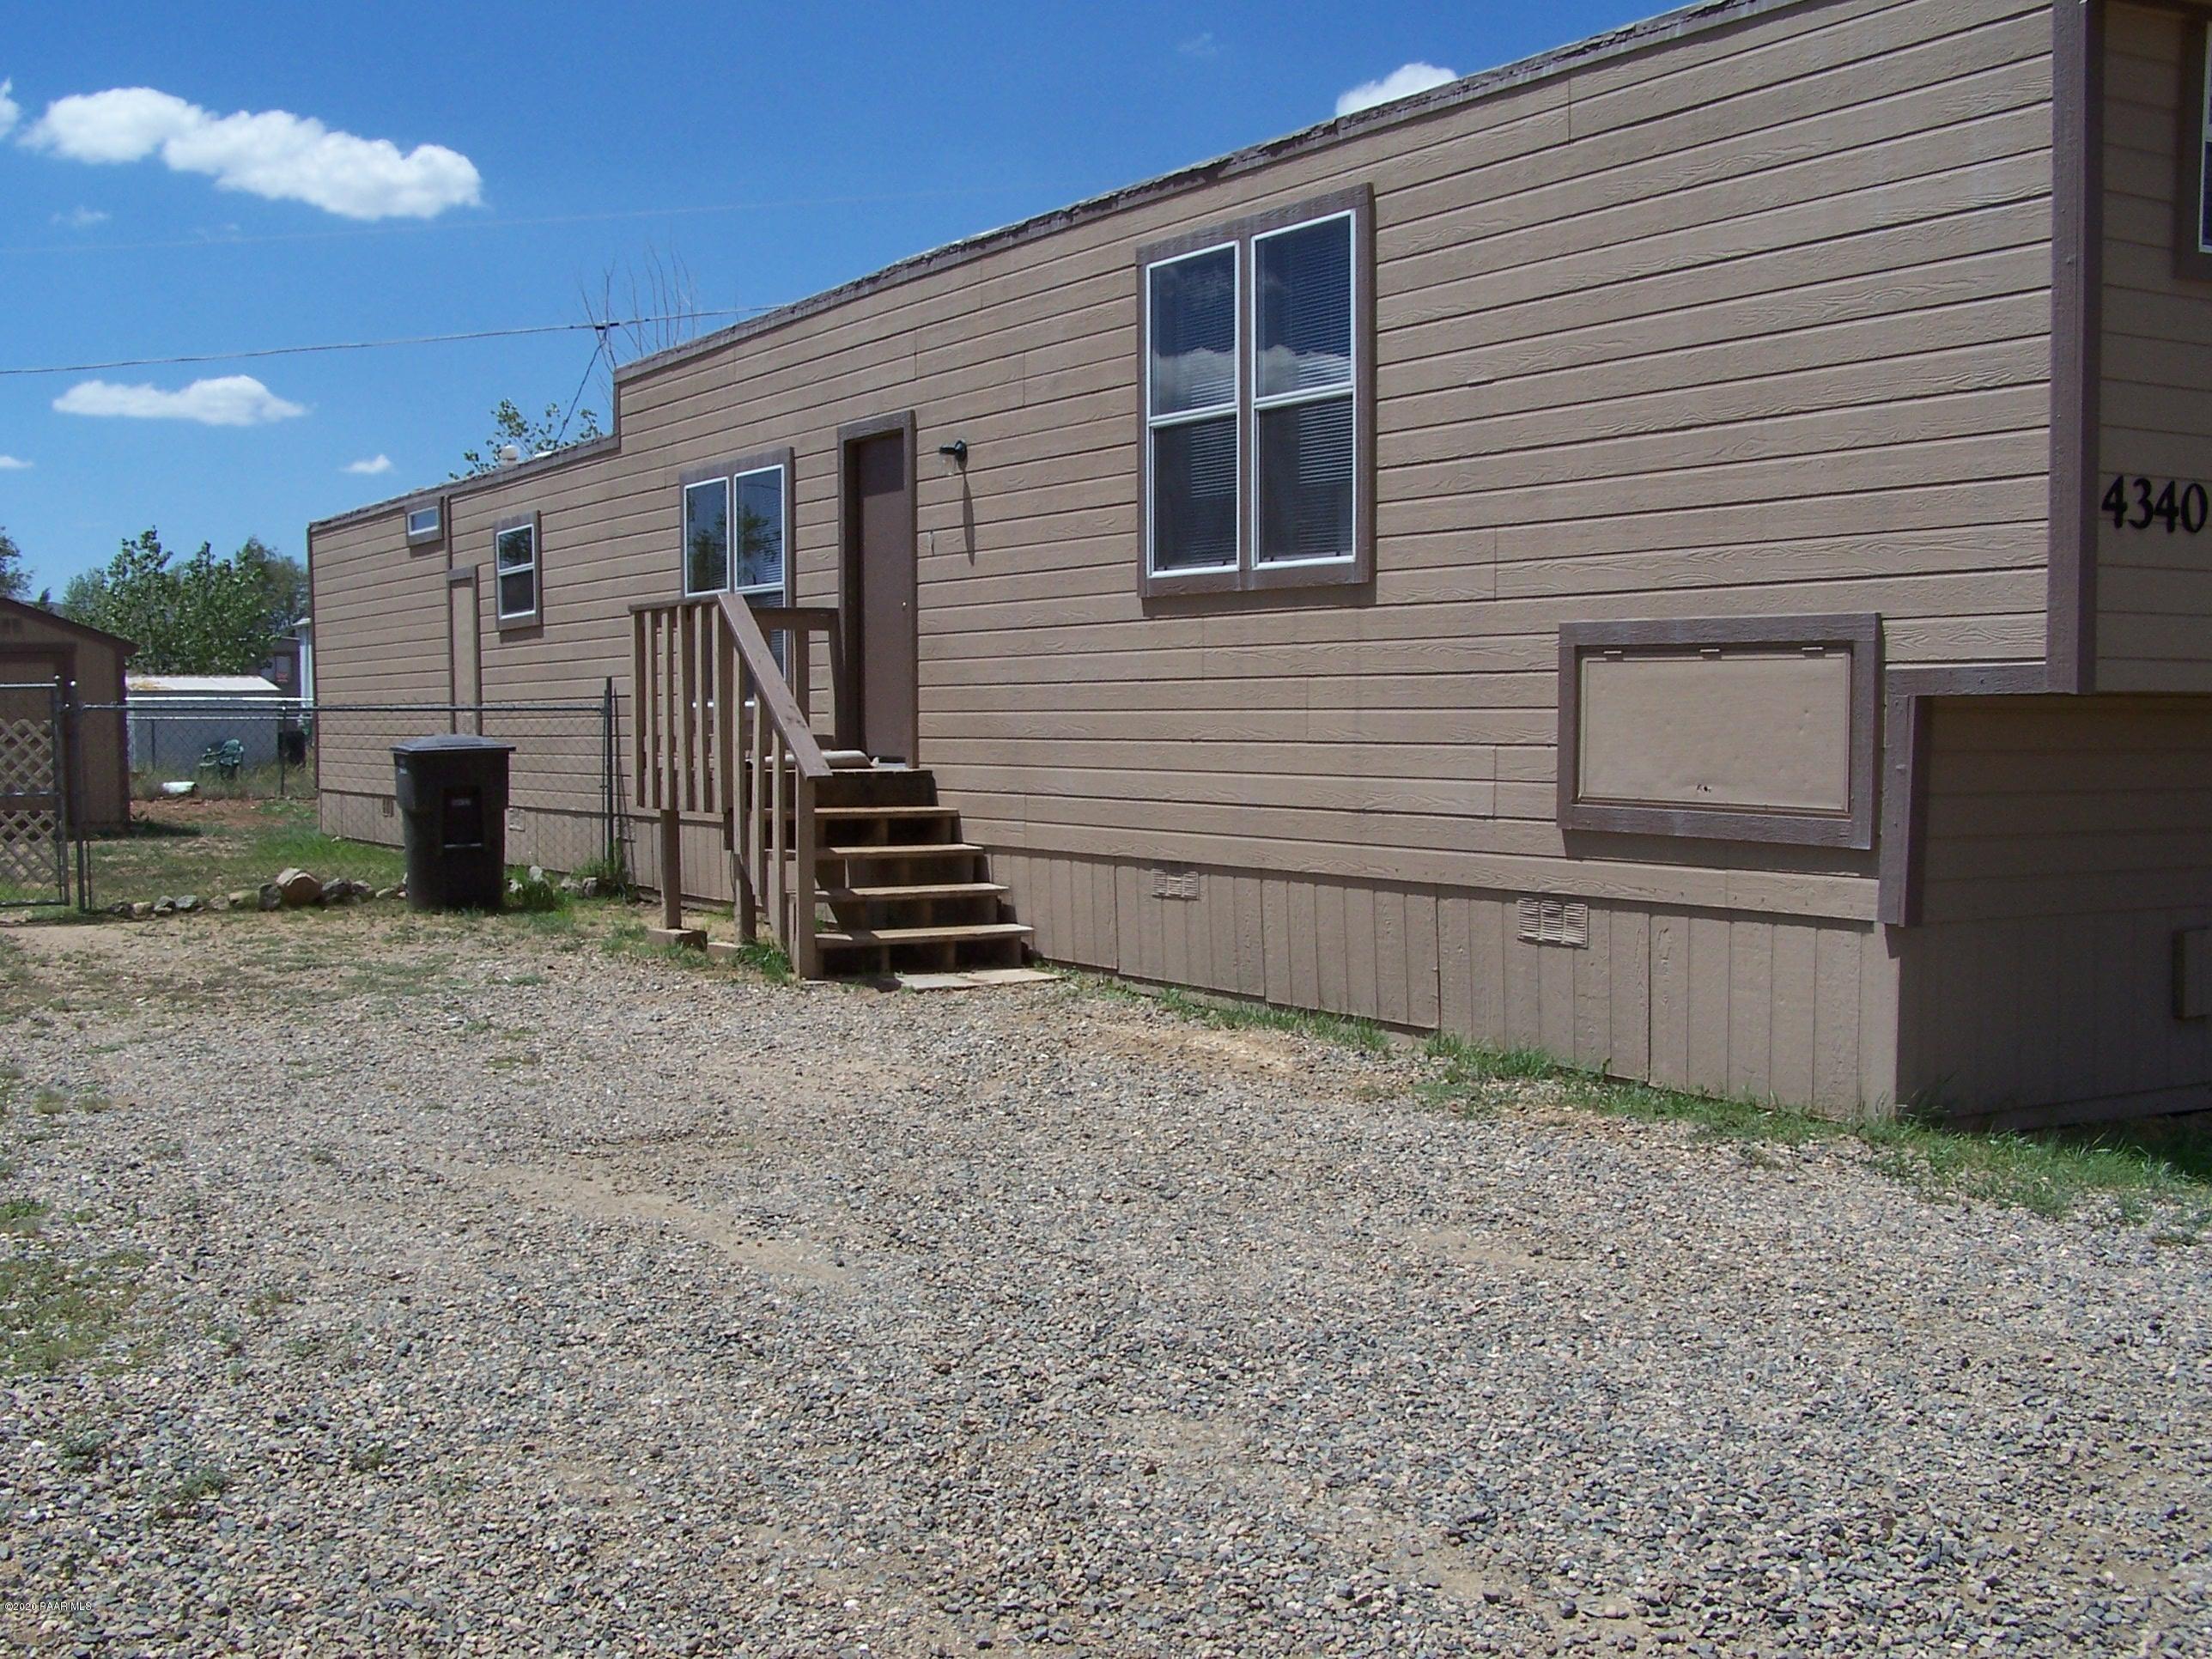 Photo of 4340 Katie, Prescott Valley, AZ 86314